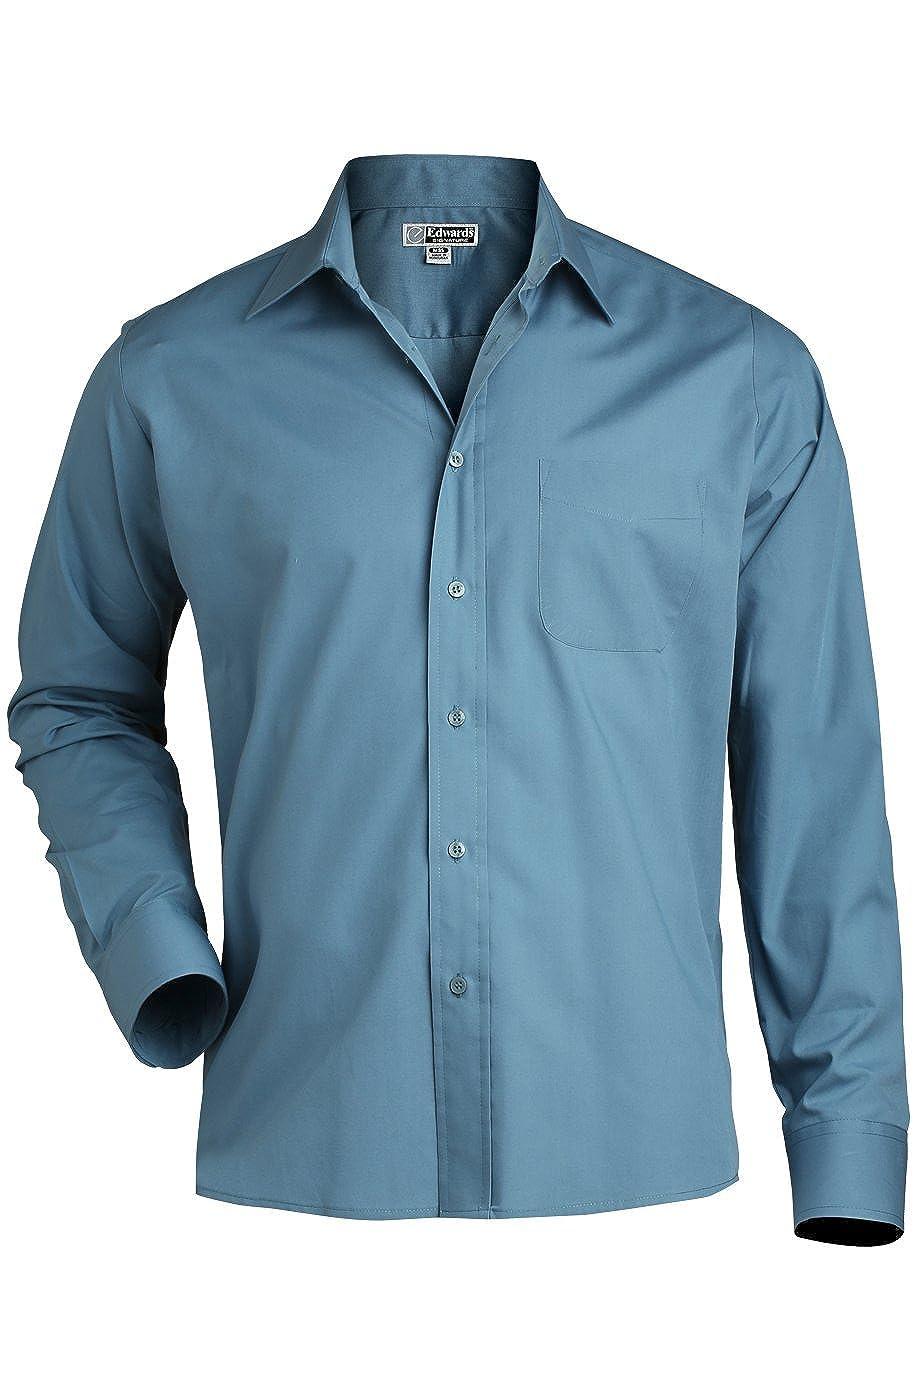 Slate Blue 6X L 35 Edwards MenS 1363 Performance Button Down Shirt